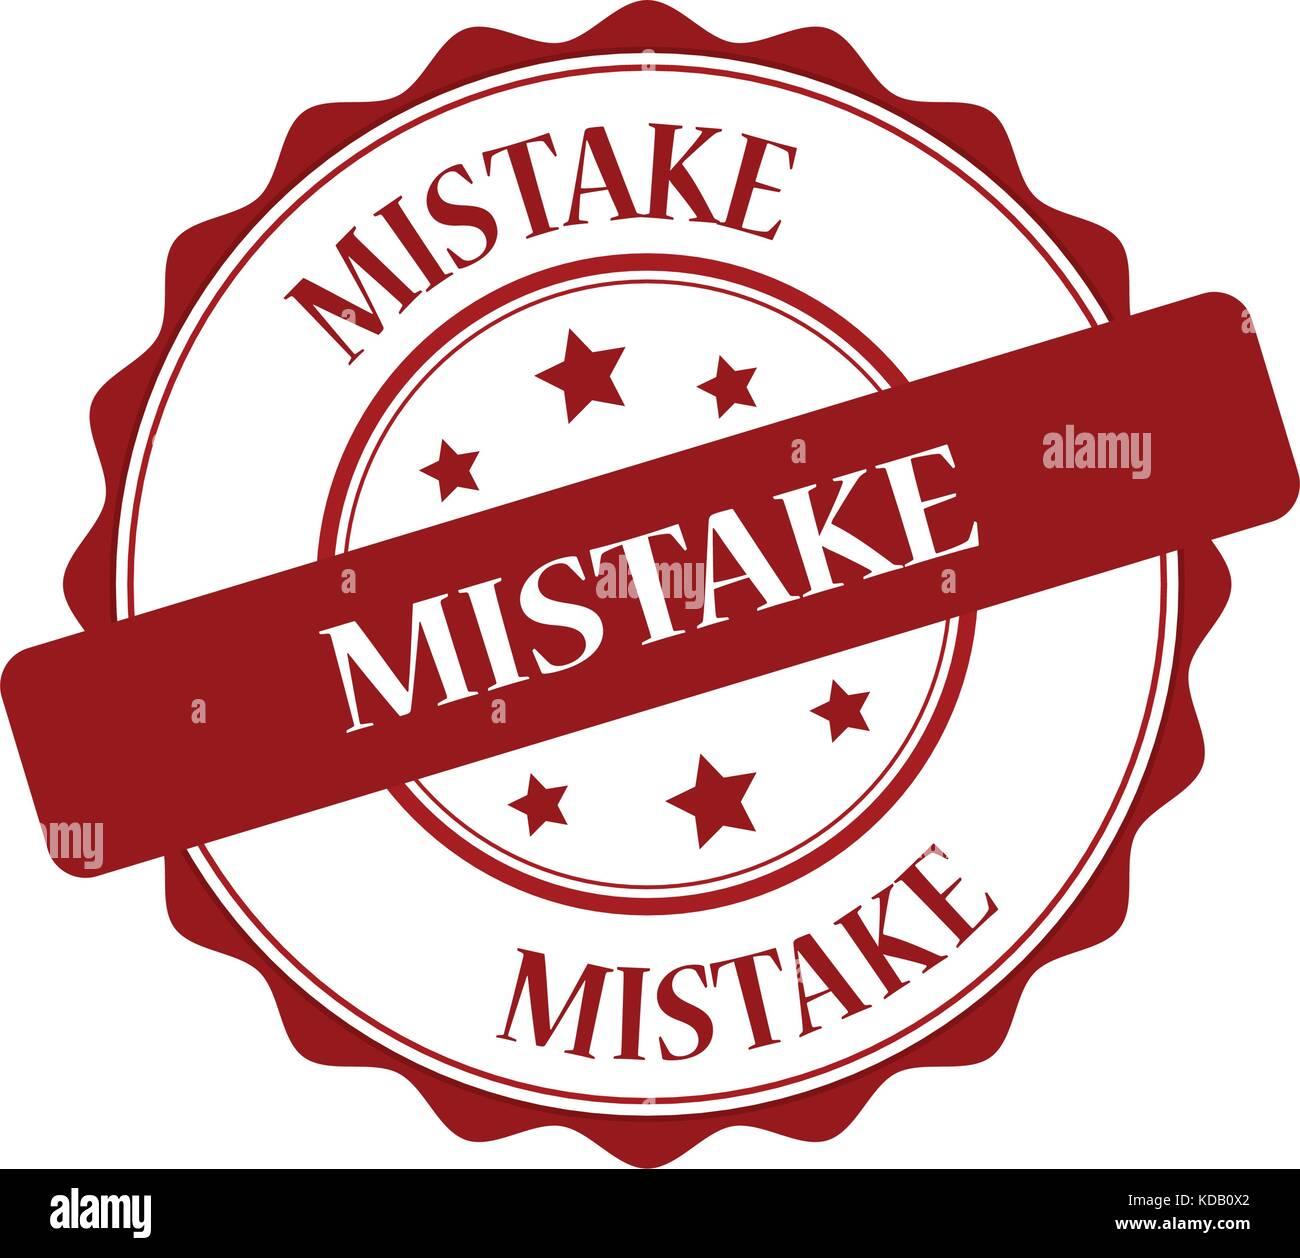 mistake red stamp illustration - Stock Image